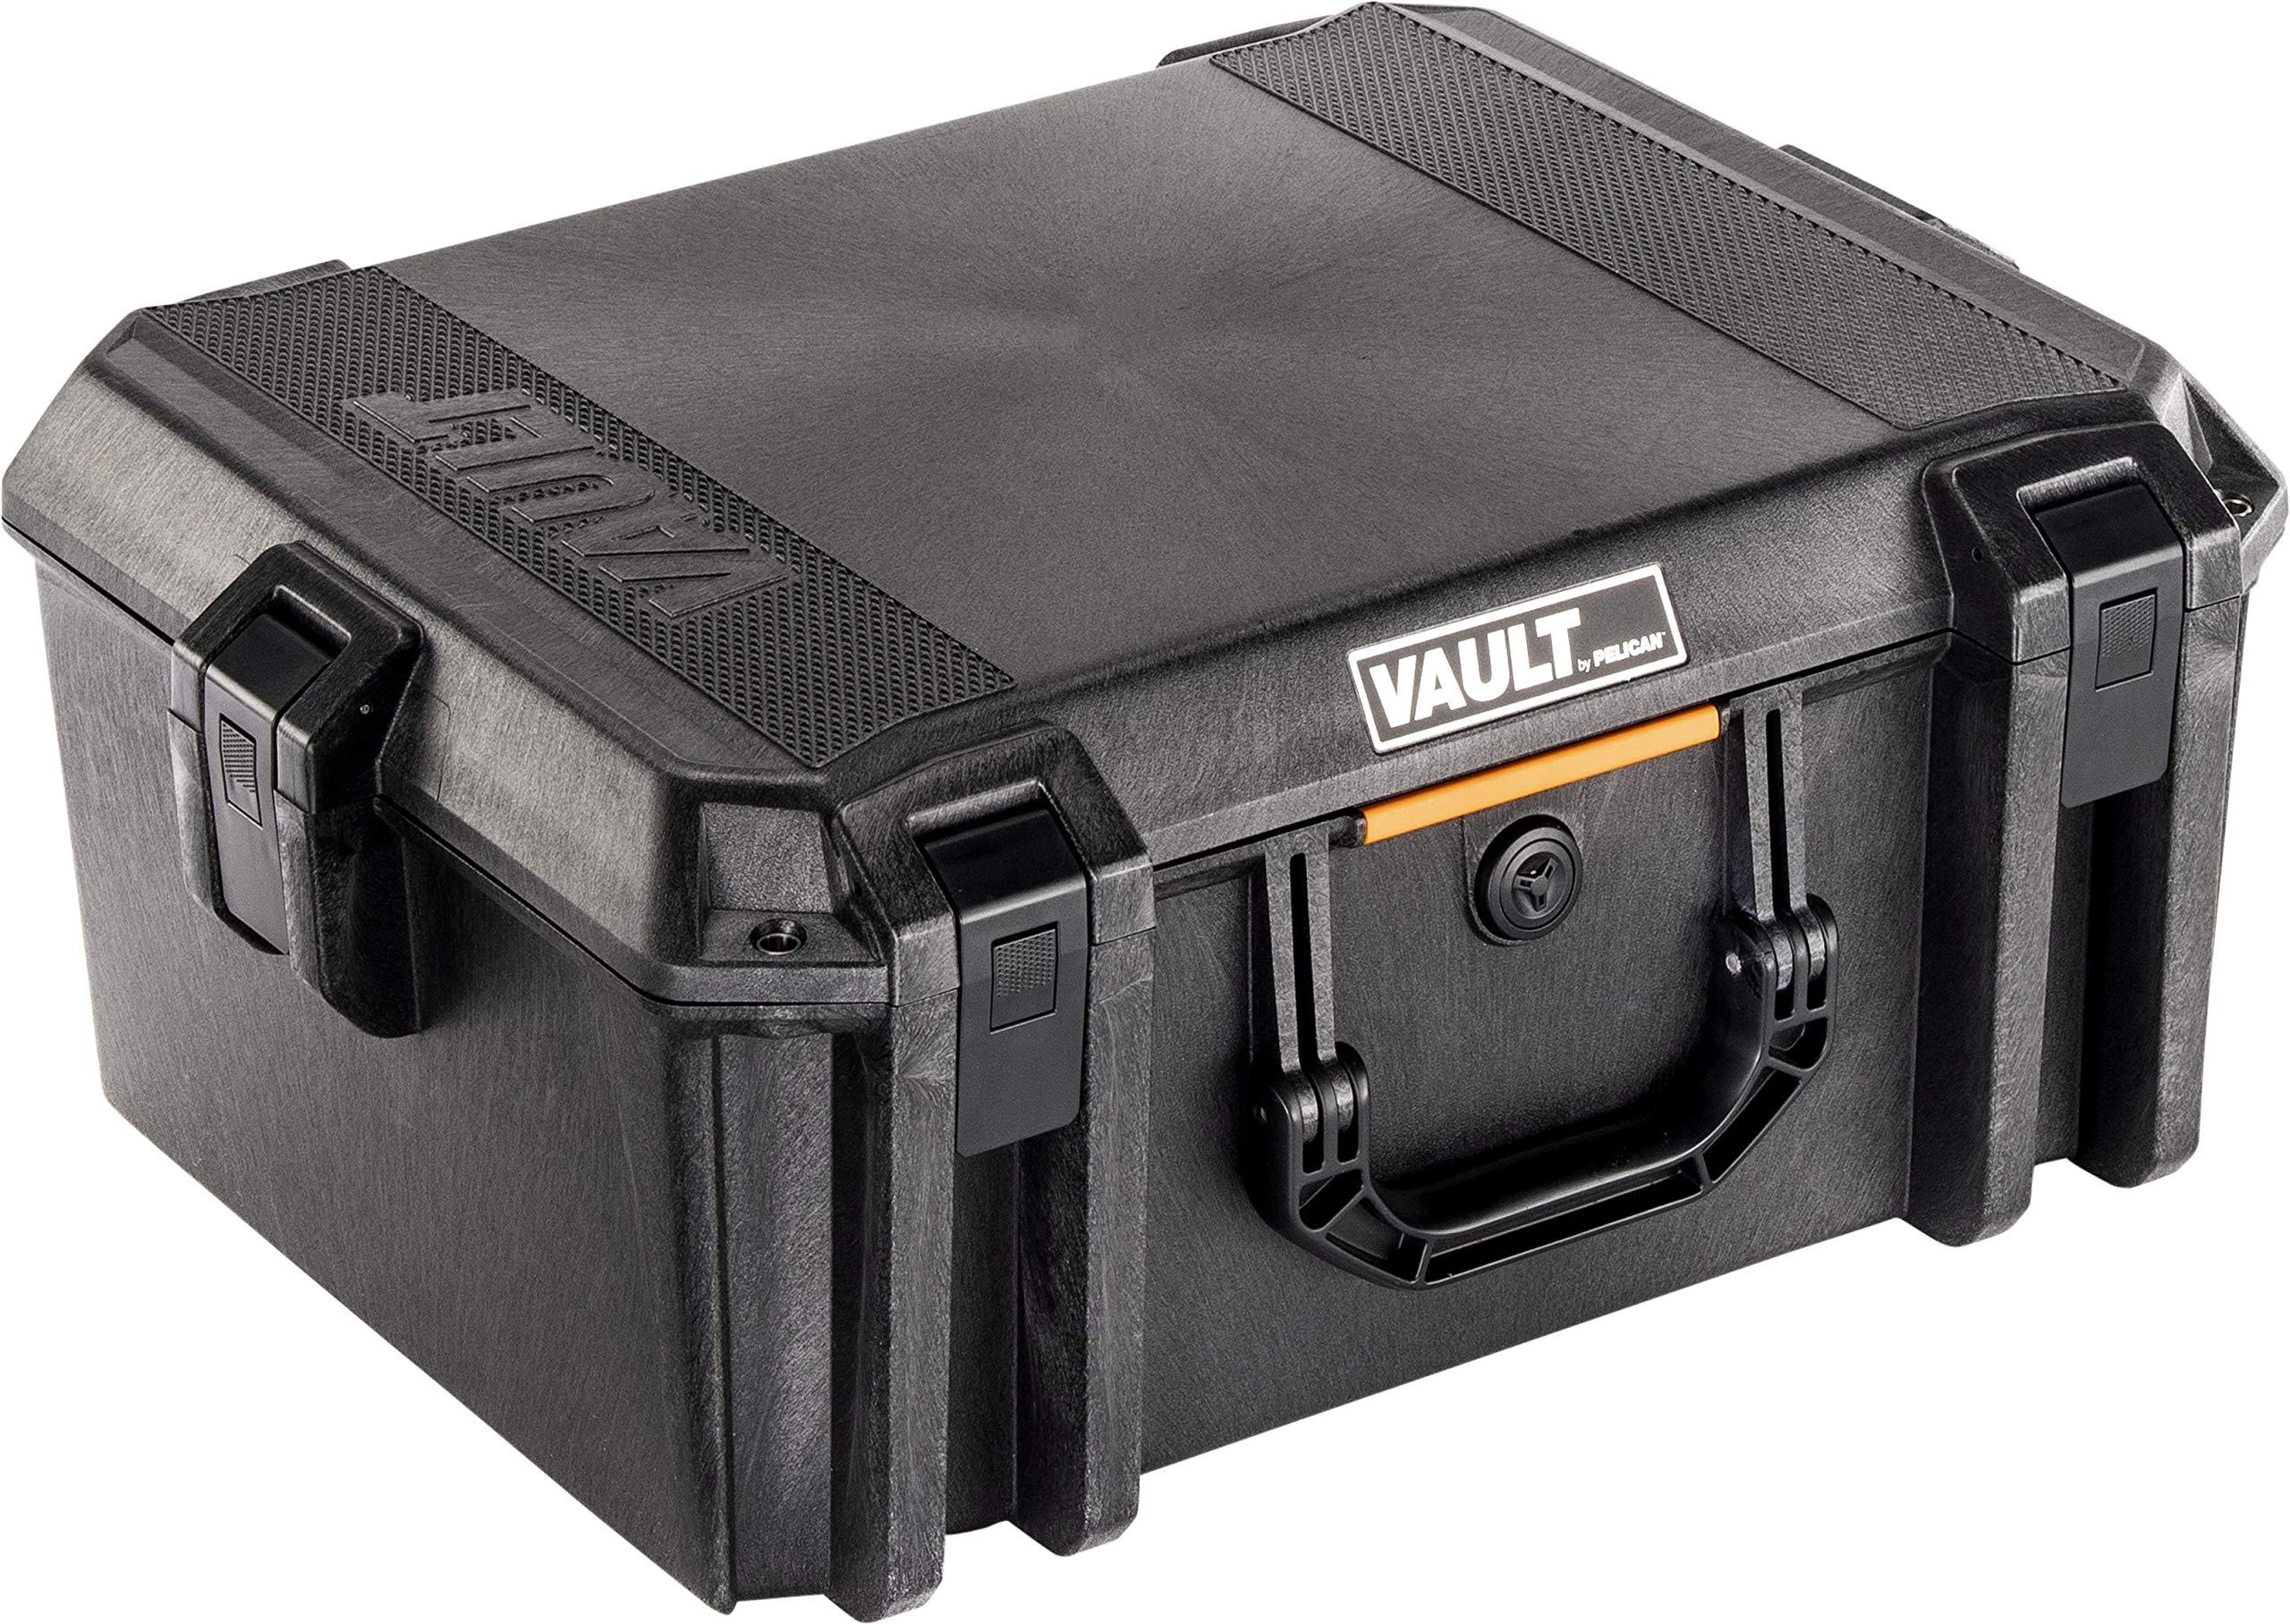 Pelican VCV550-0000-BLK V550 Equipment Case Black w/Foam by Pelican